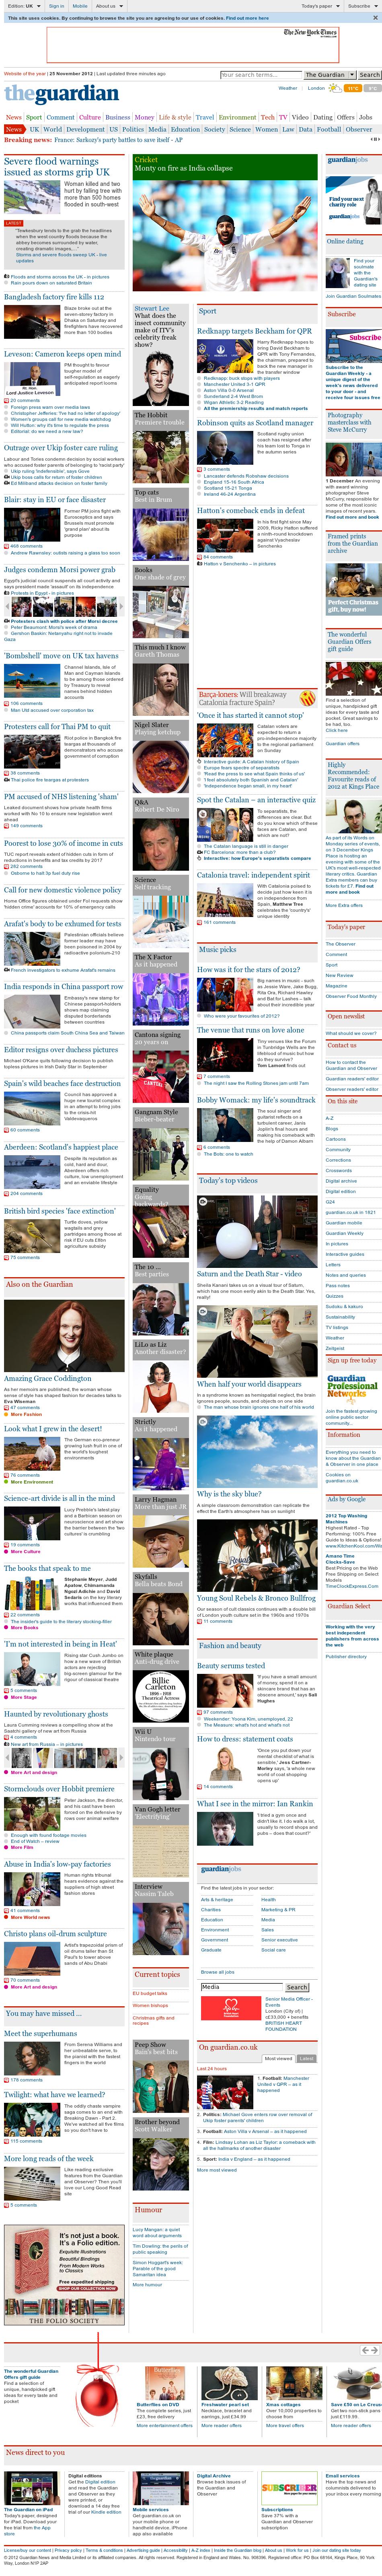 The Guardian at Sunday Nov. 25, 2012, 12:12 p.m. UTC